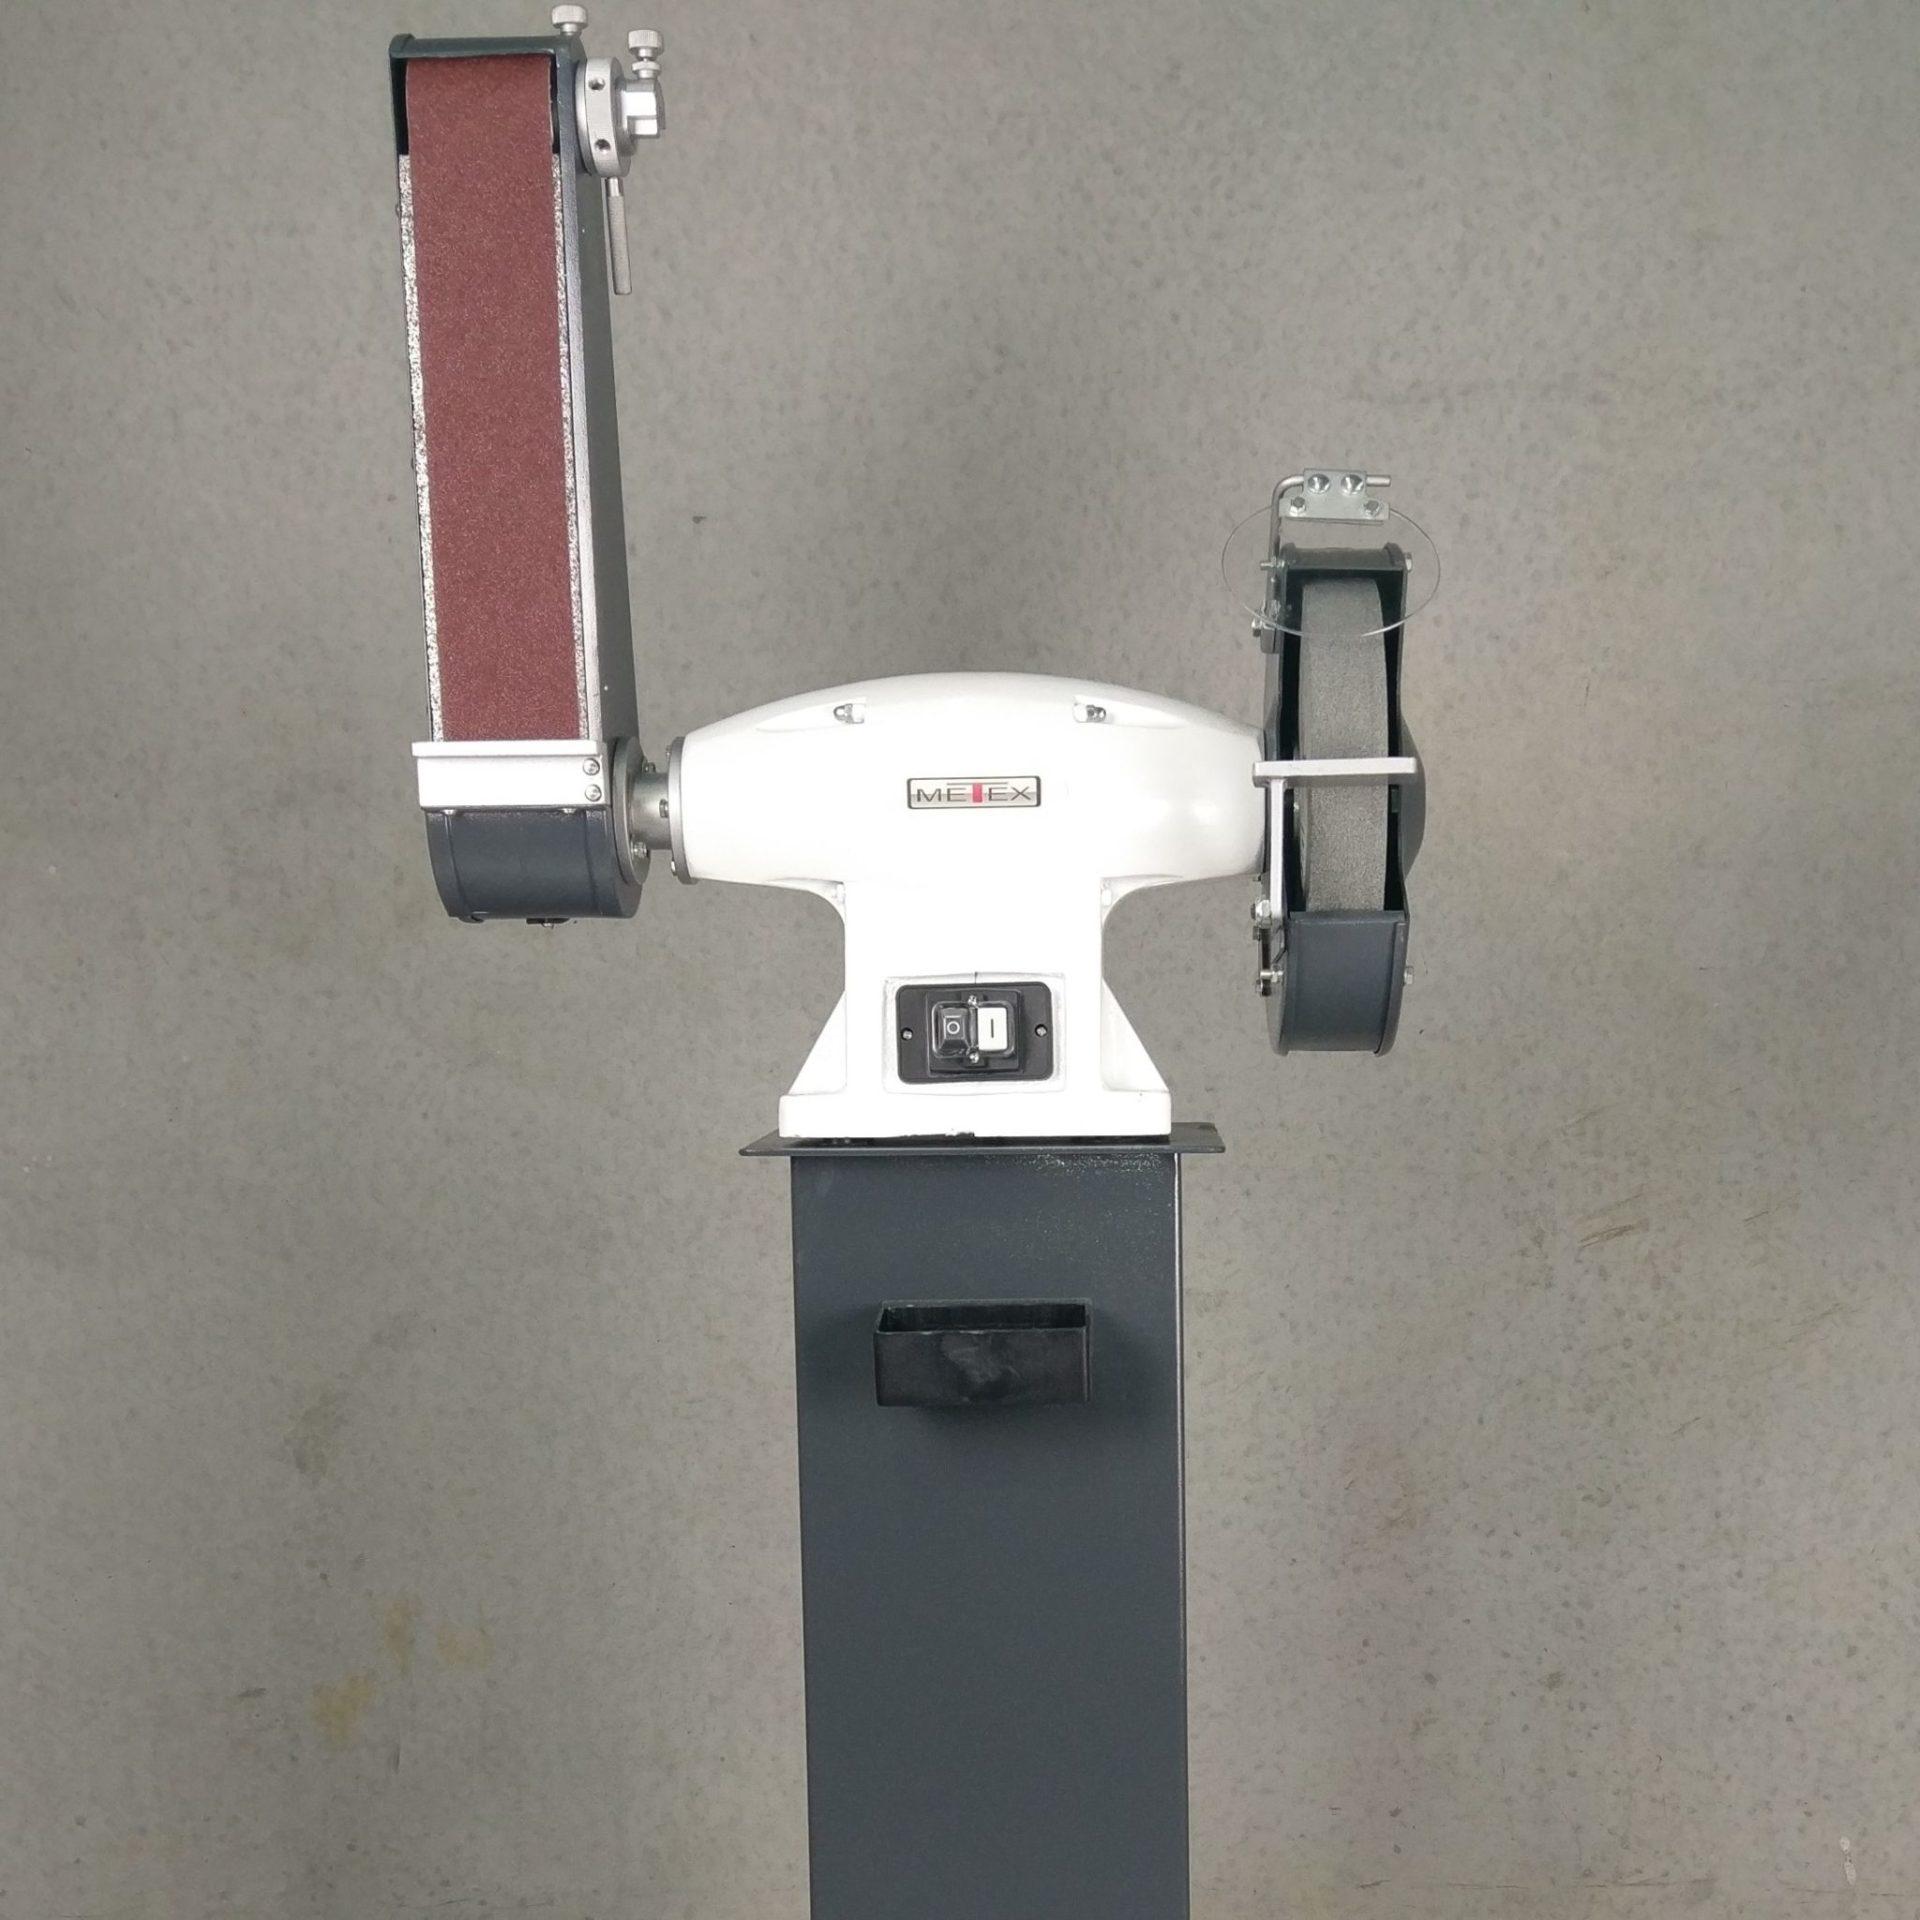 Metex 250mm 10 Combo Bench Grinder Linisher 240v 2hp